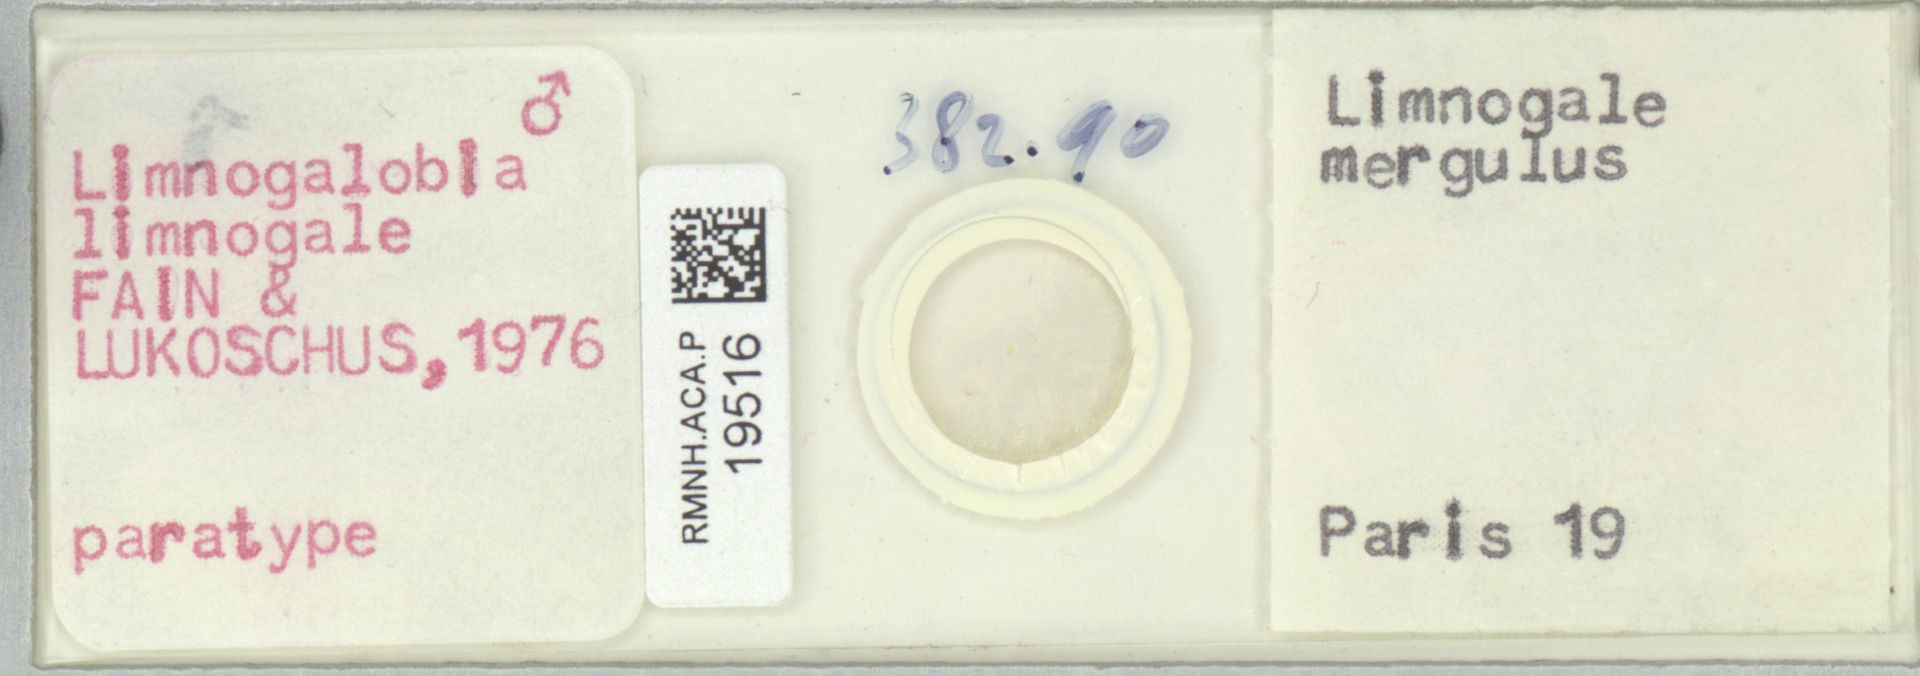 RMNH.ACA.P.19516 | Limnogalobia limnogale